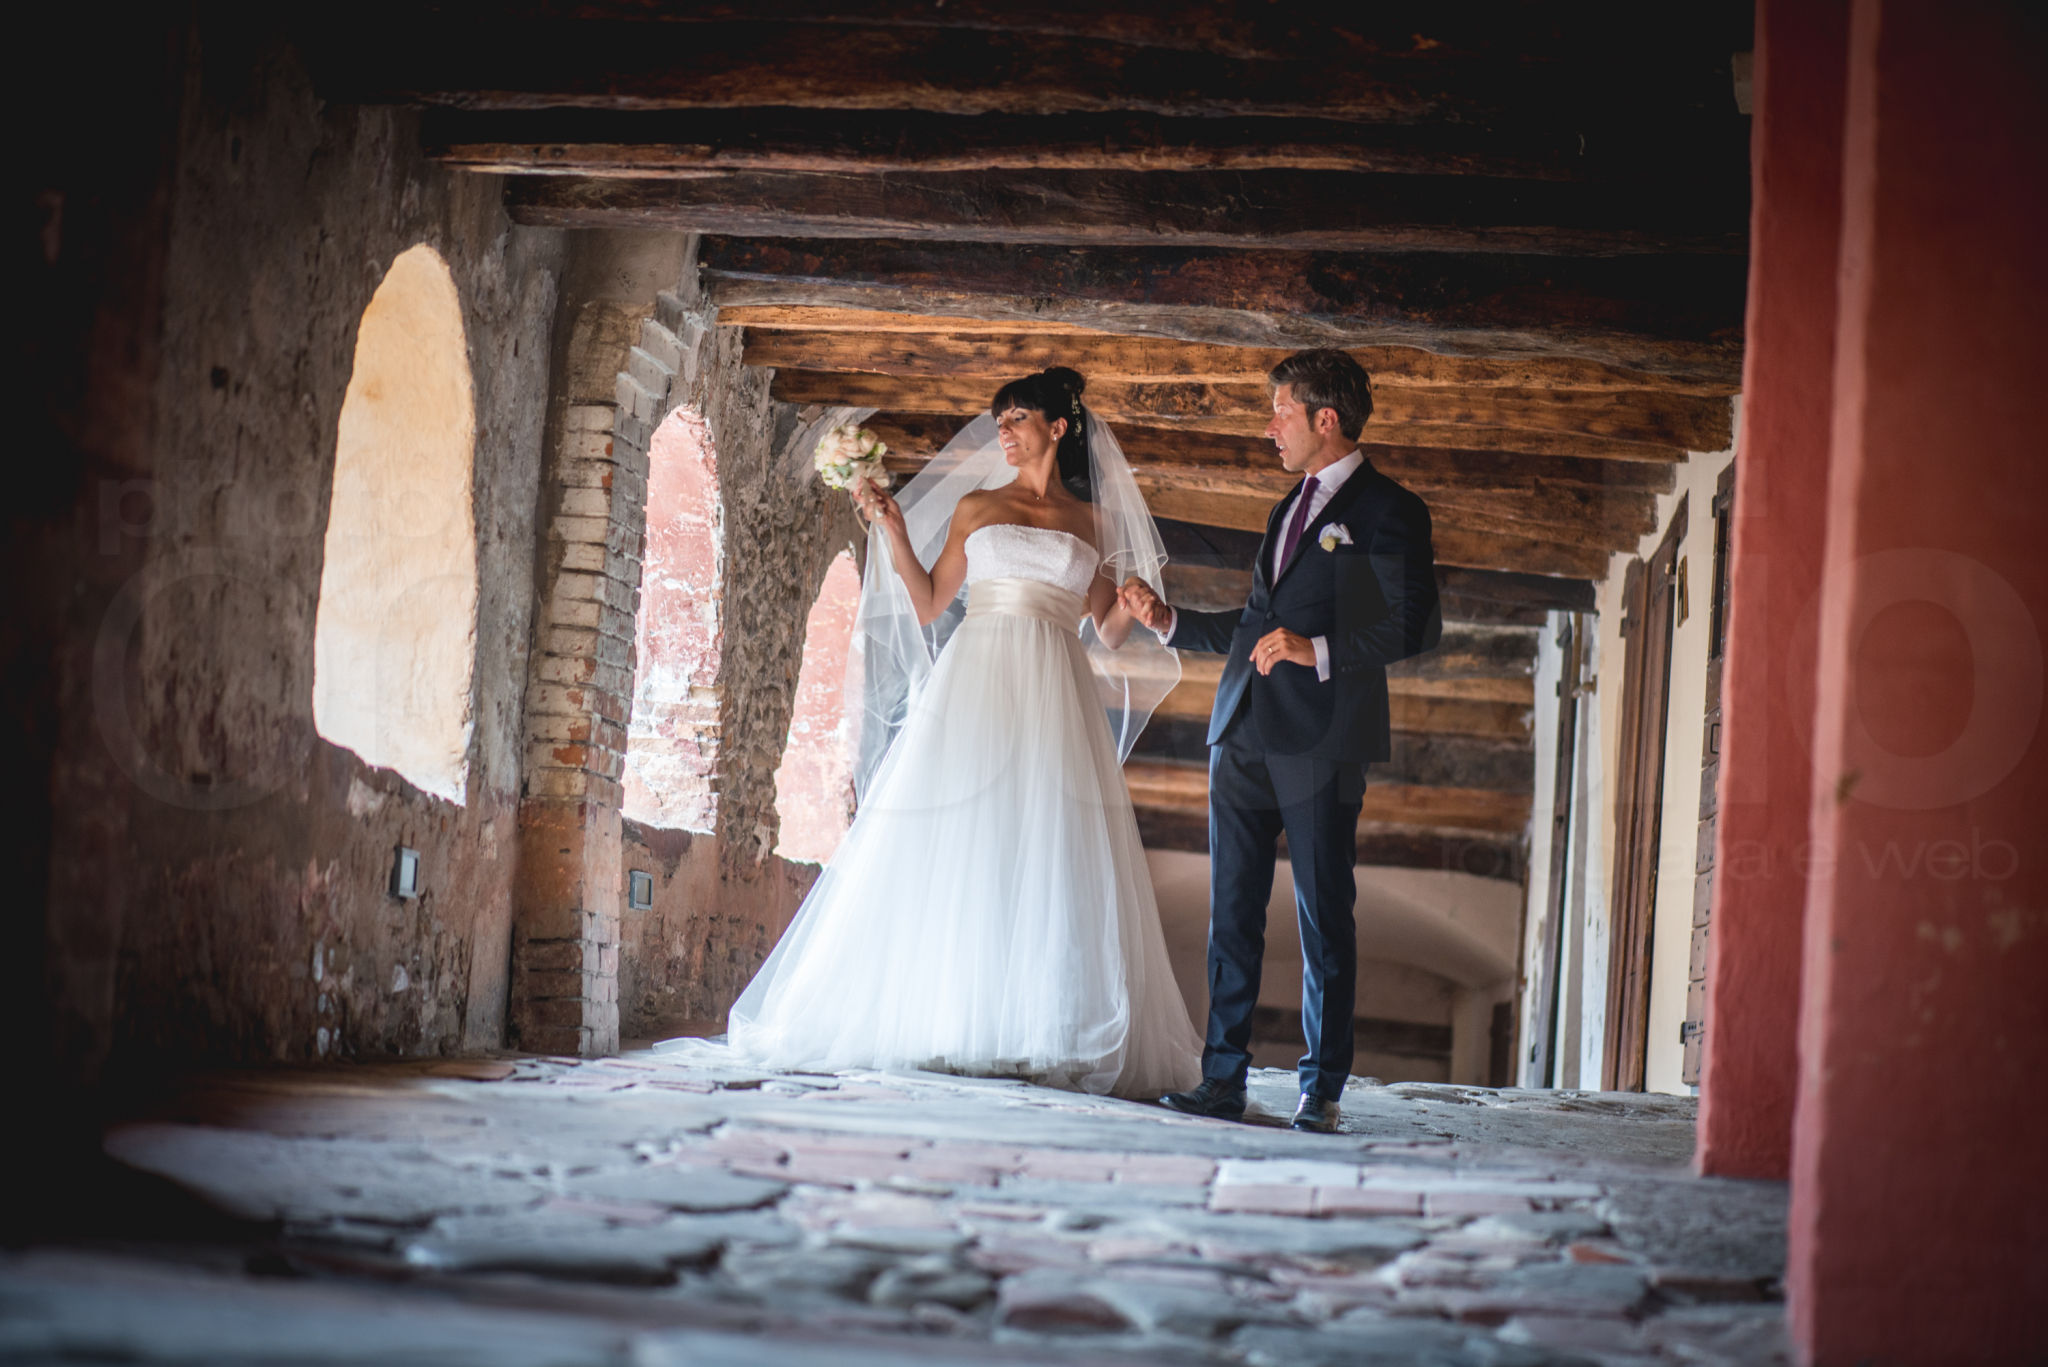 https://lnx.mirkone.it/wp-content/uploads/2015/07/fotografo-matrimoni-faenza-0019.jpg